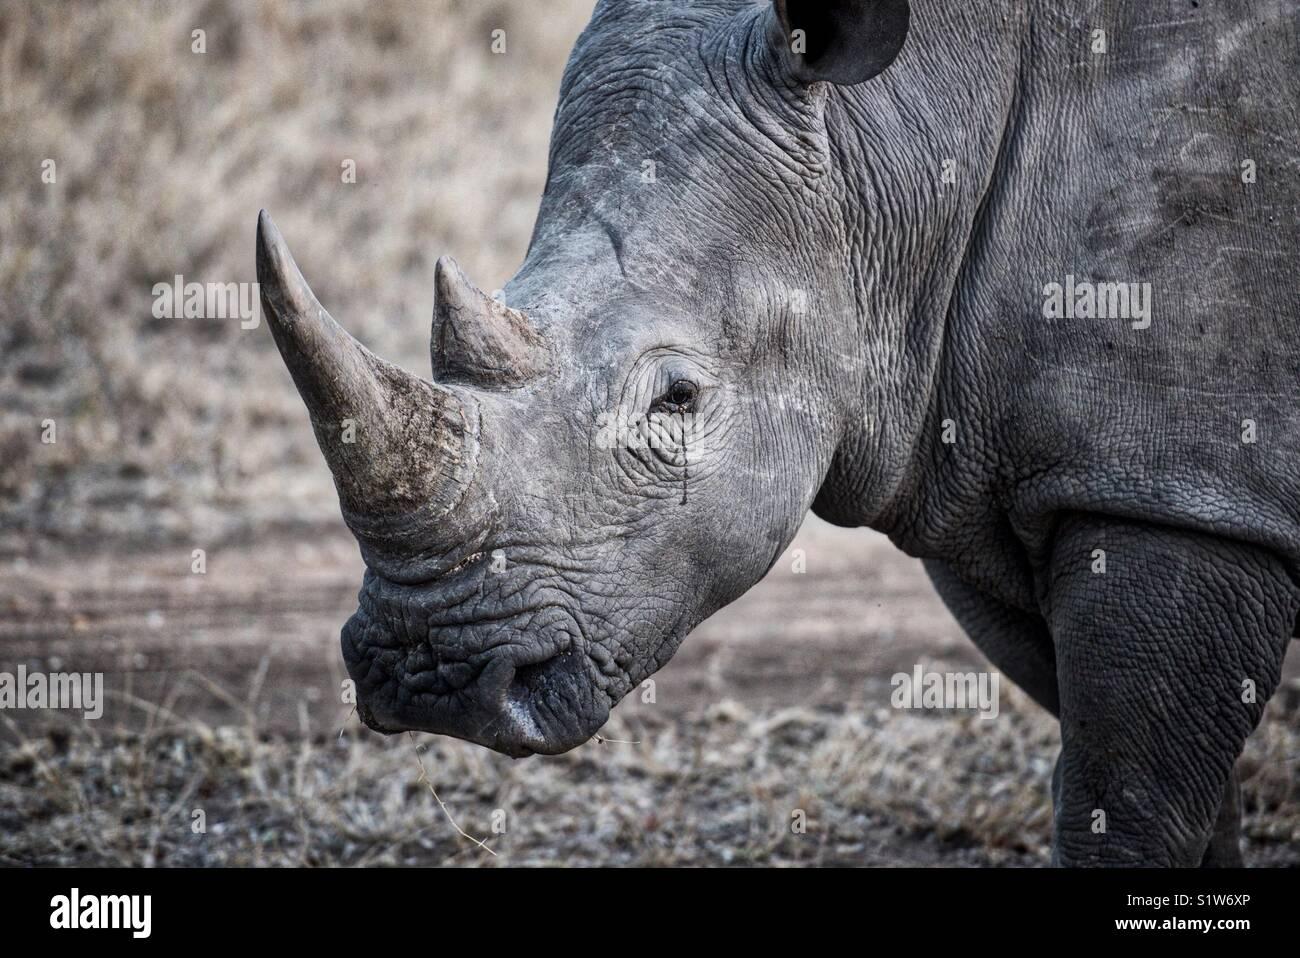 Rhino in Africa - Stock Image